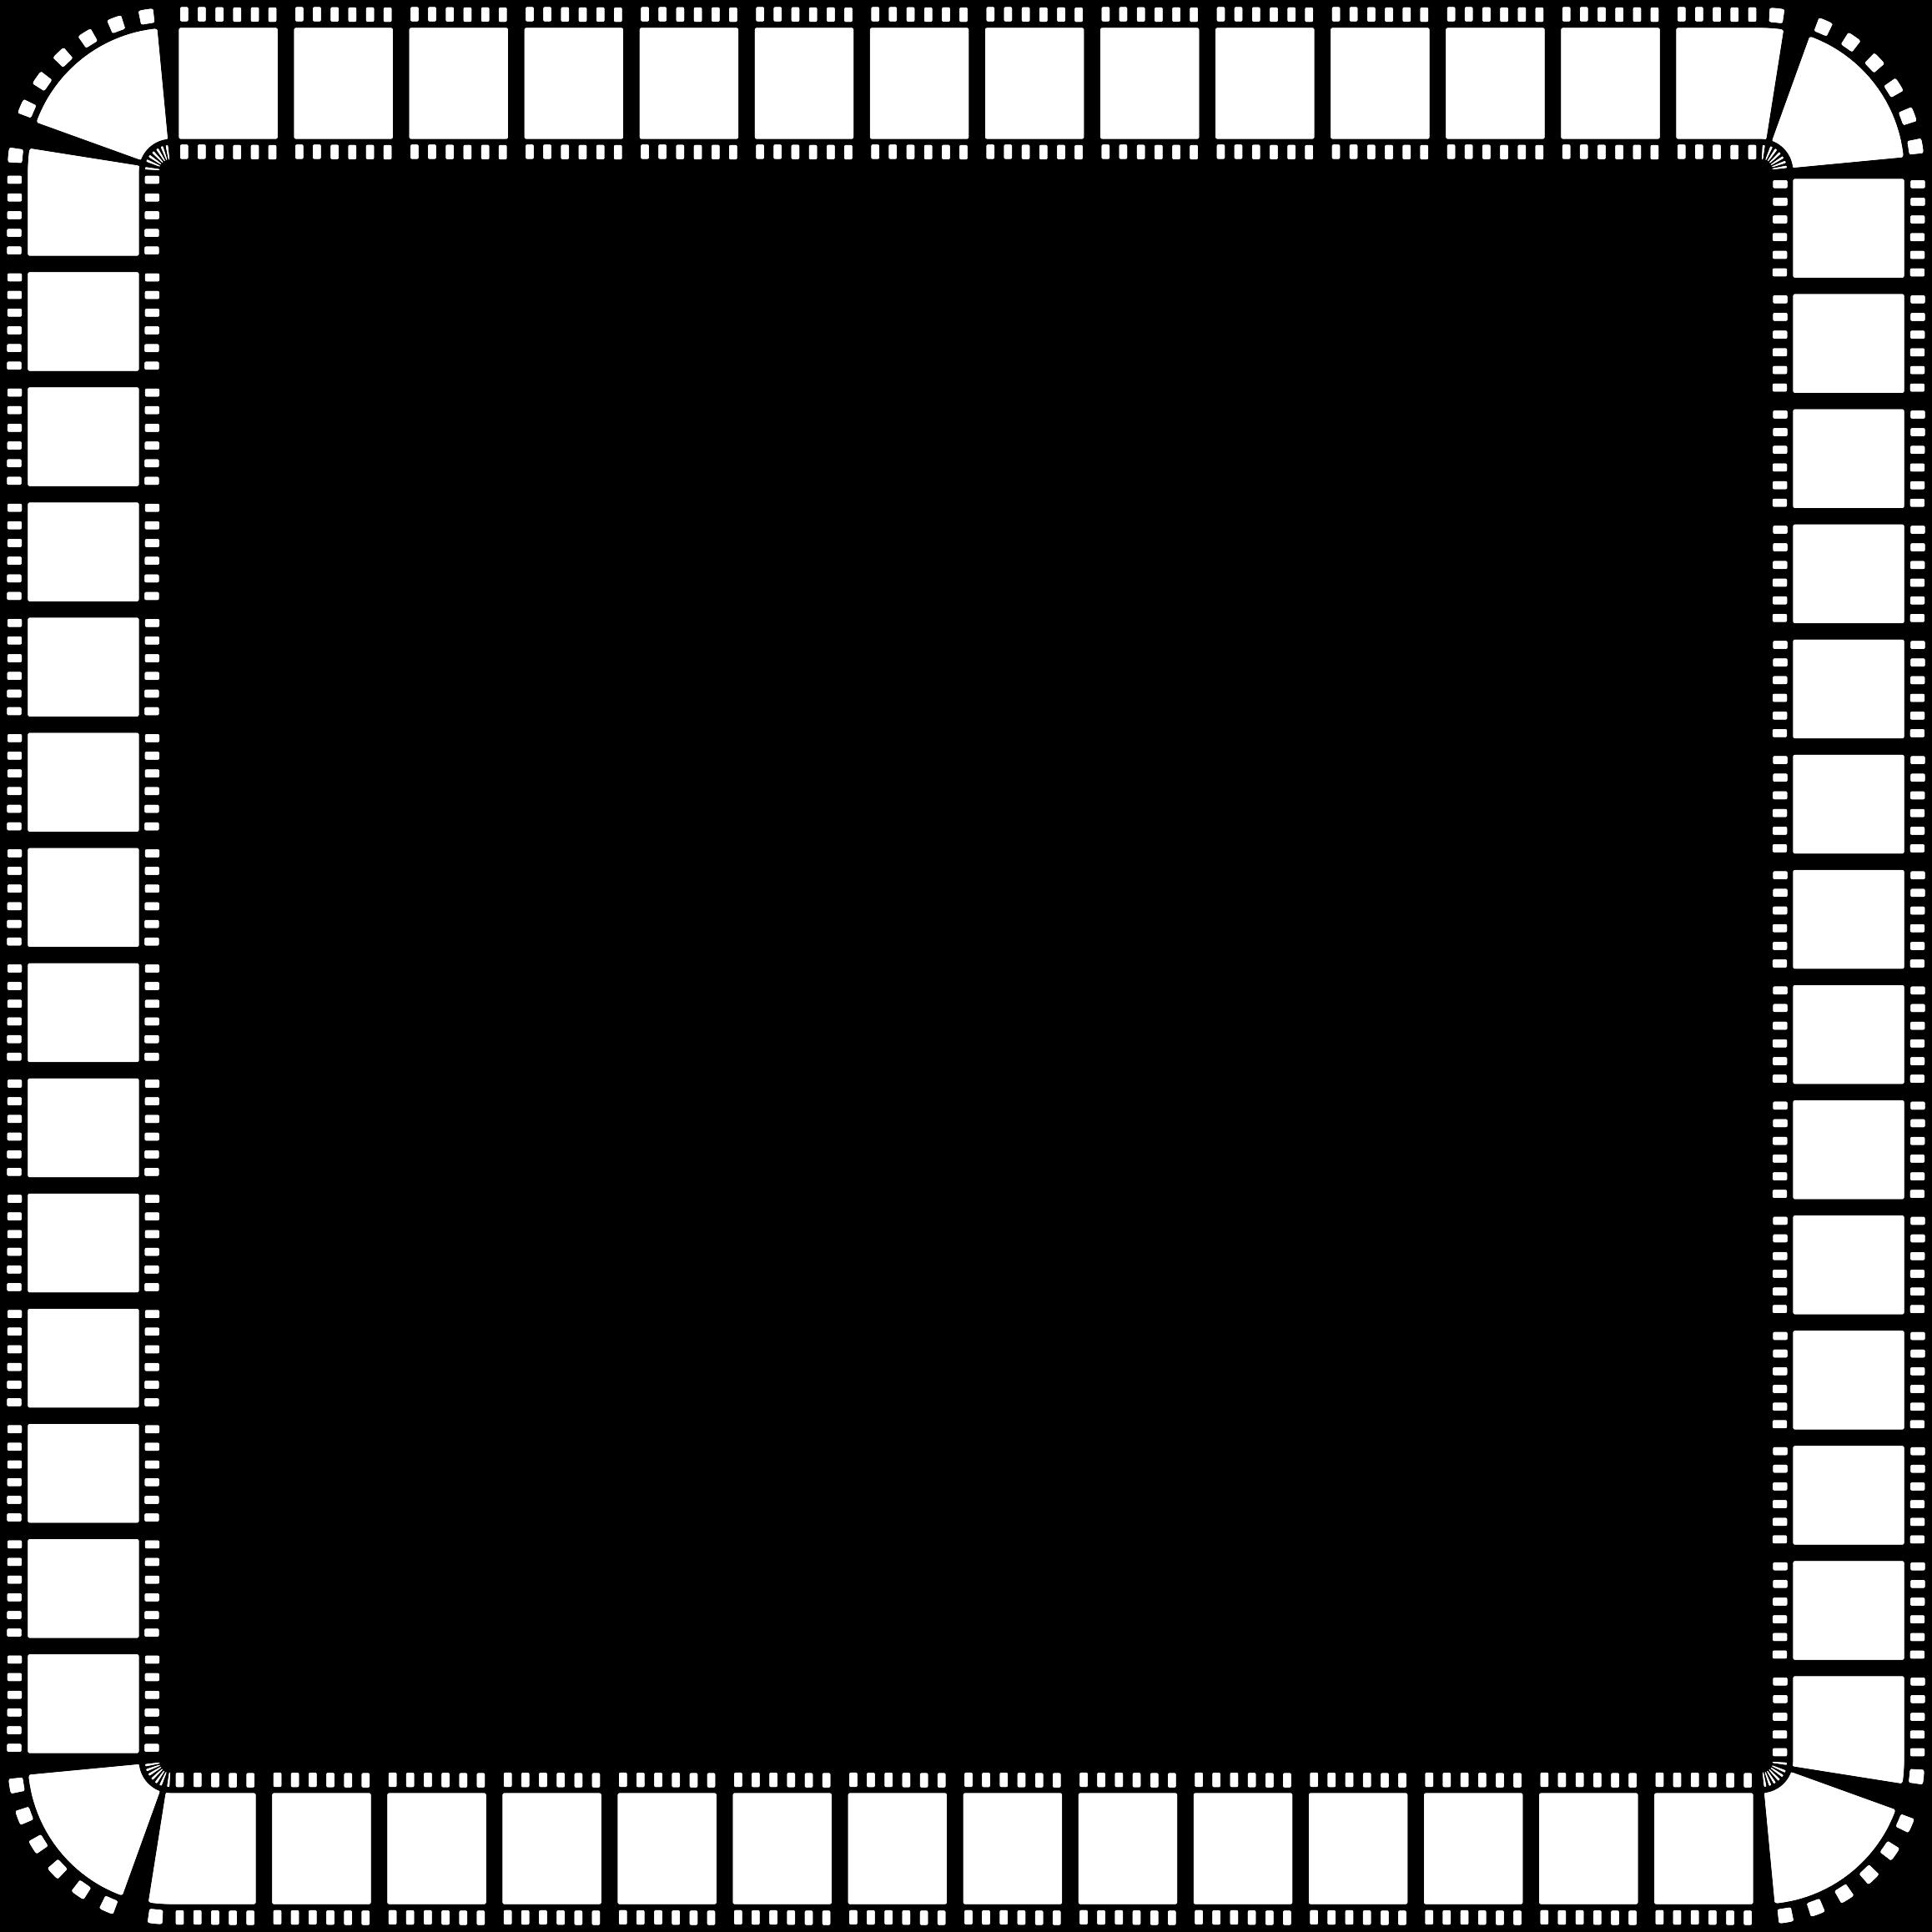 Film strip frame big. Square clipart black border